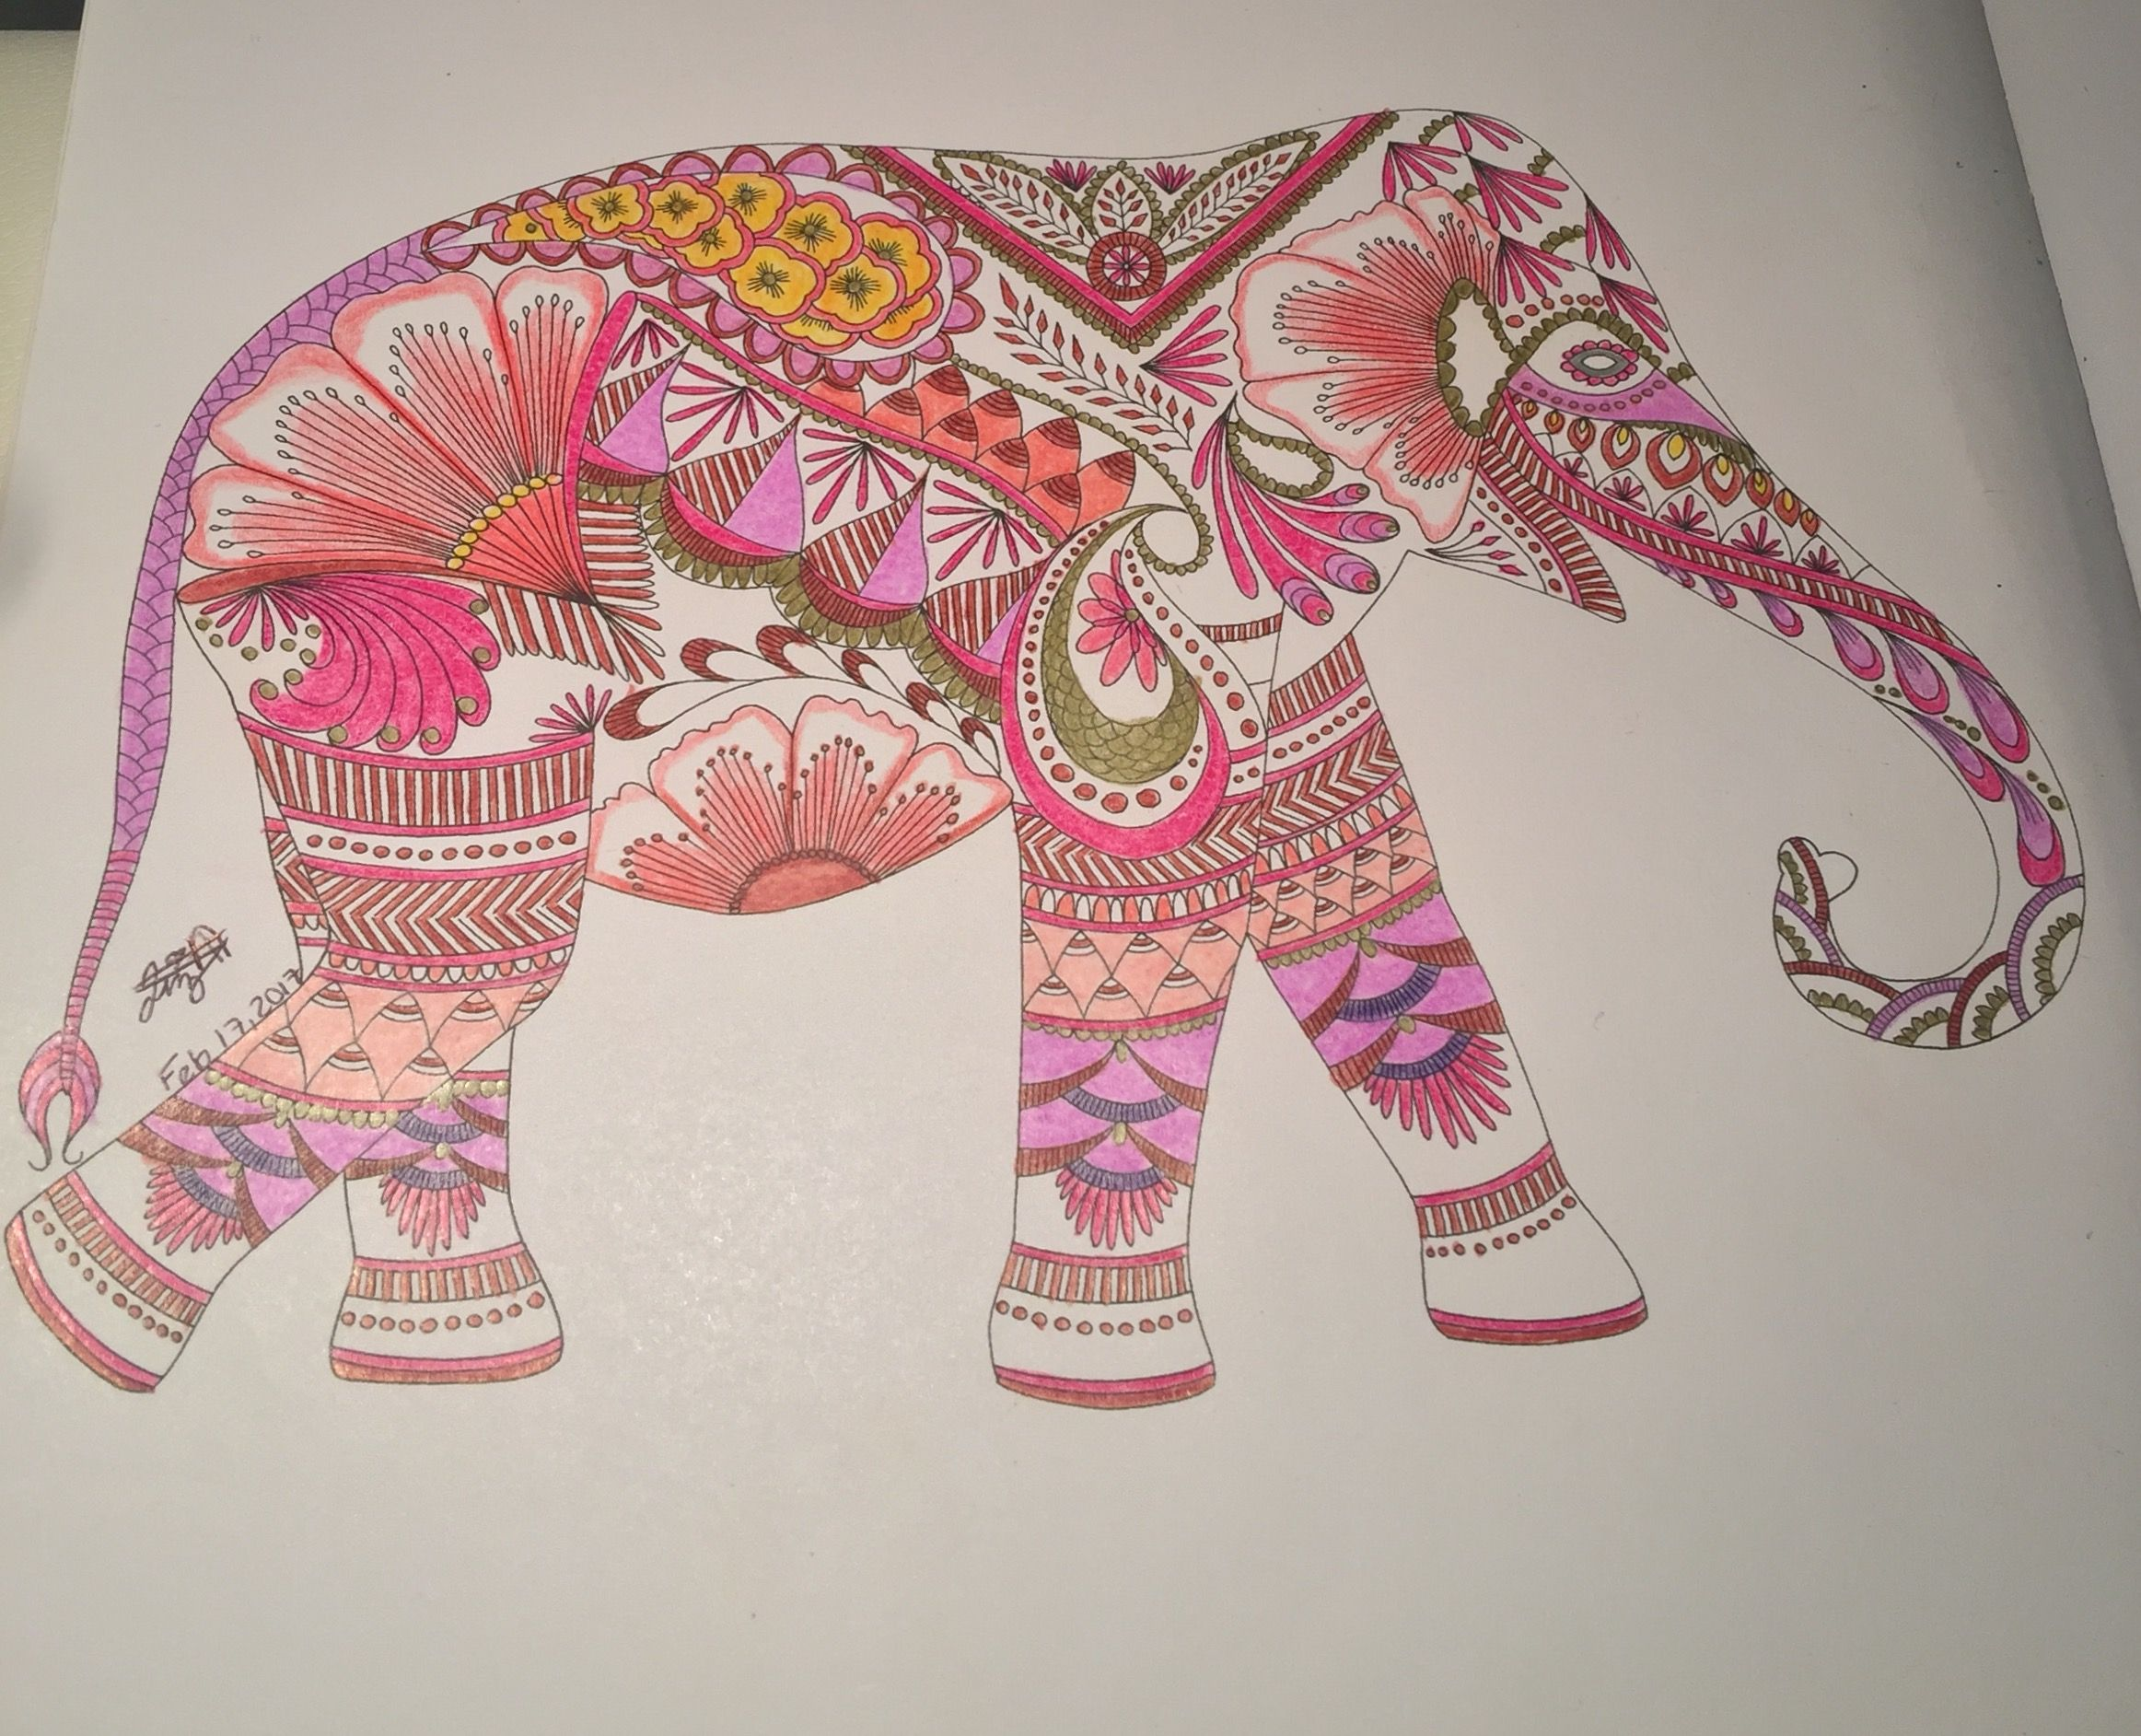 Color me draw me animal kingdom book - Animal Kingdom Millie Marotta Birds Color Me Draw Elephants Elephant